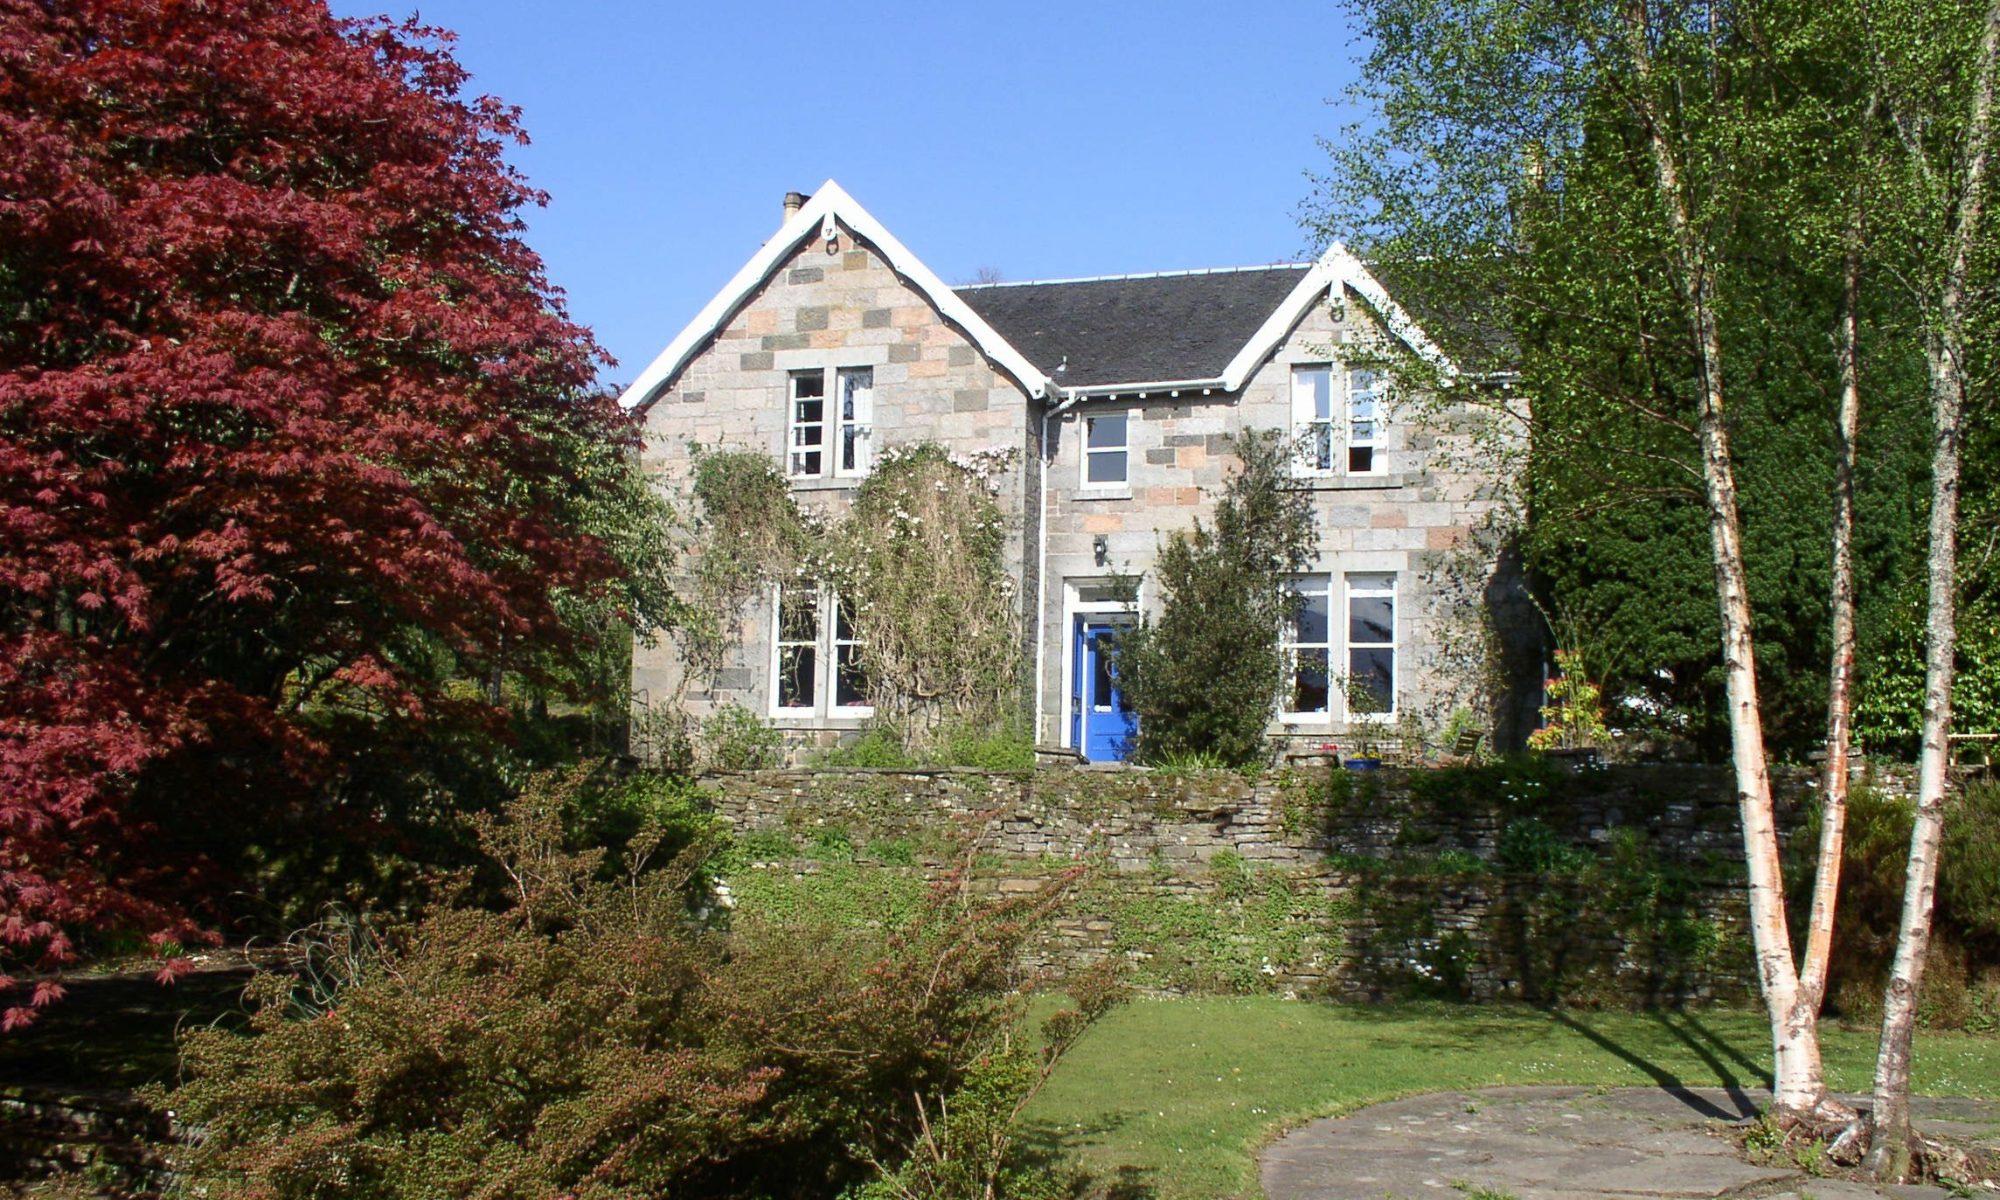 Cuildorag House